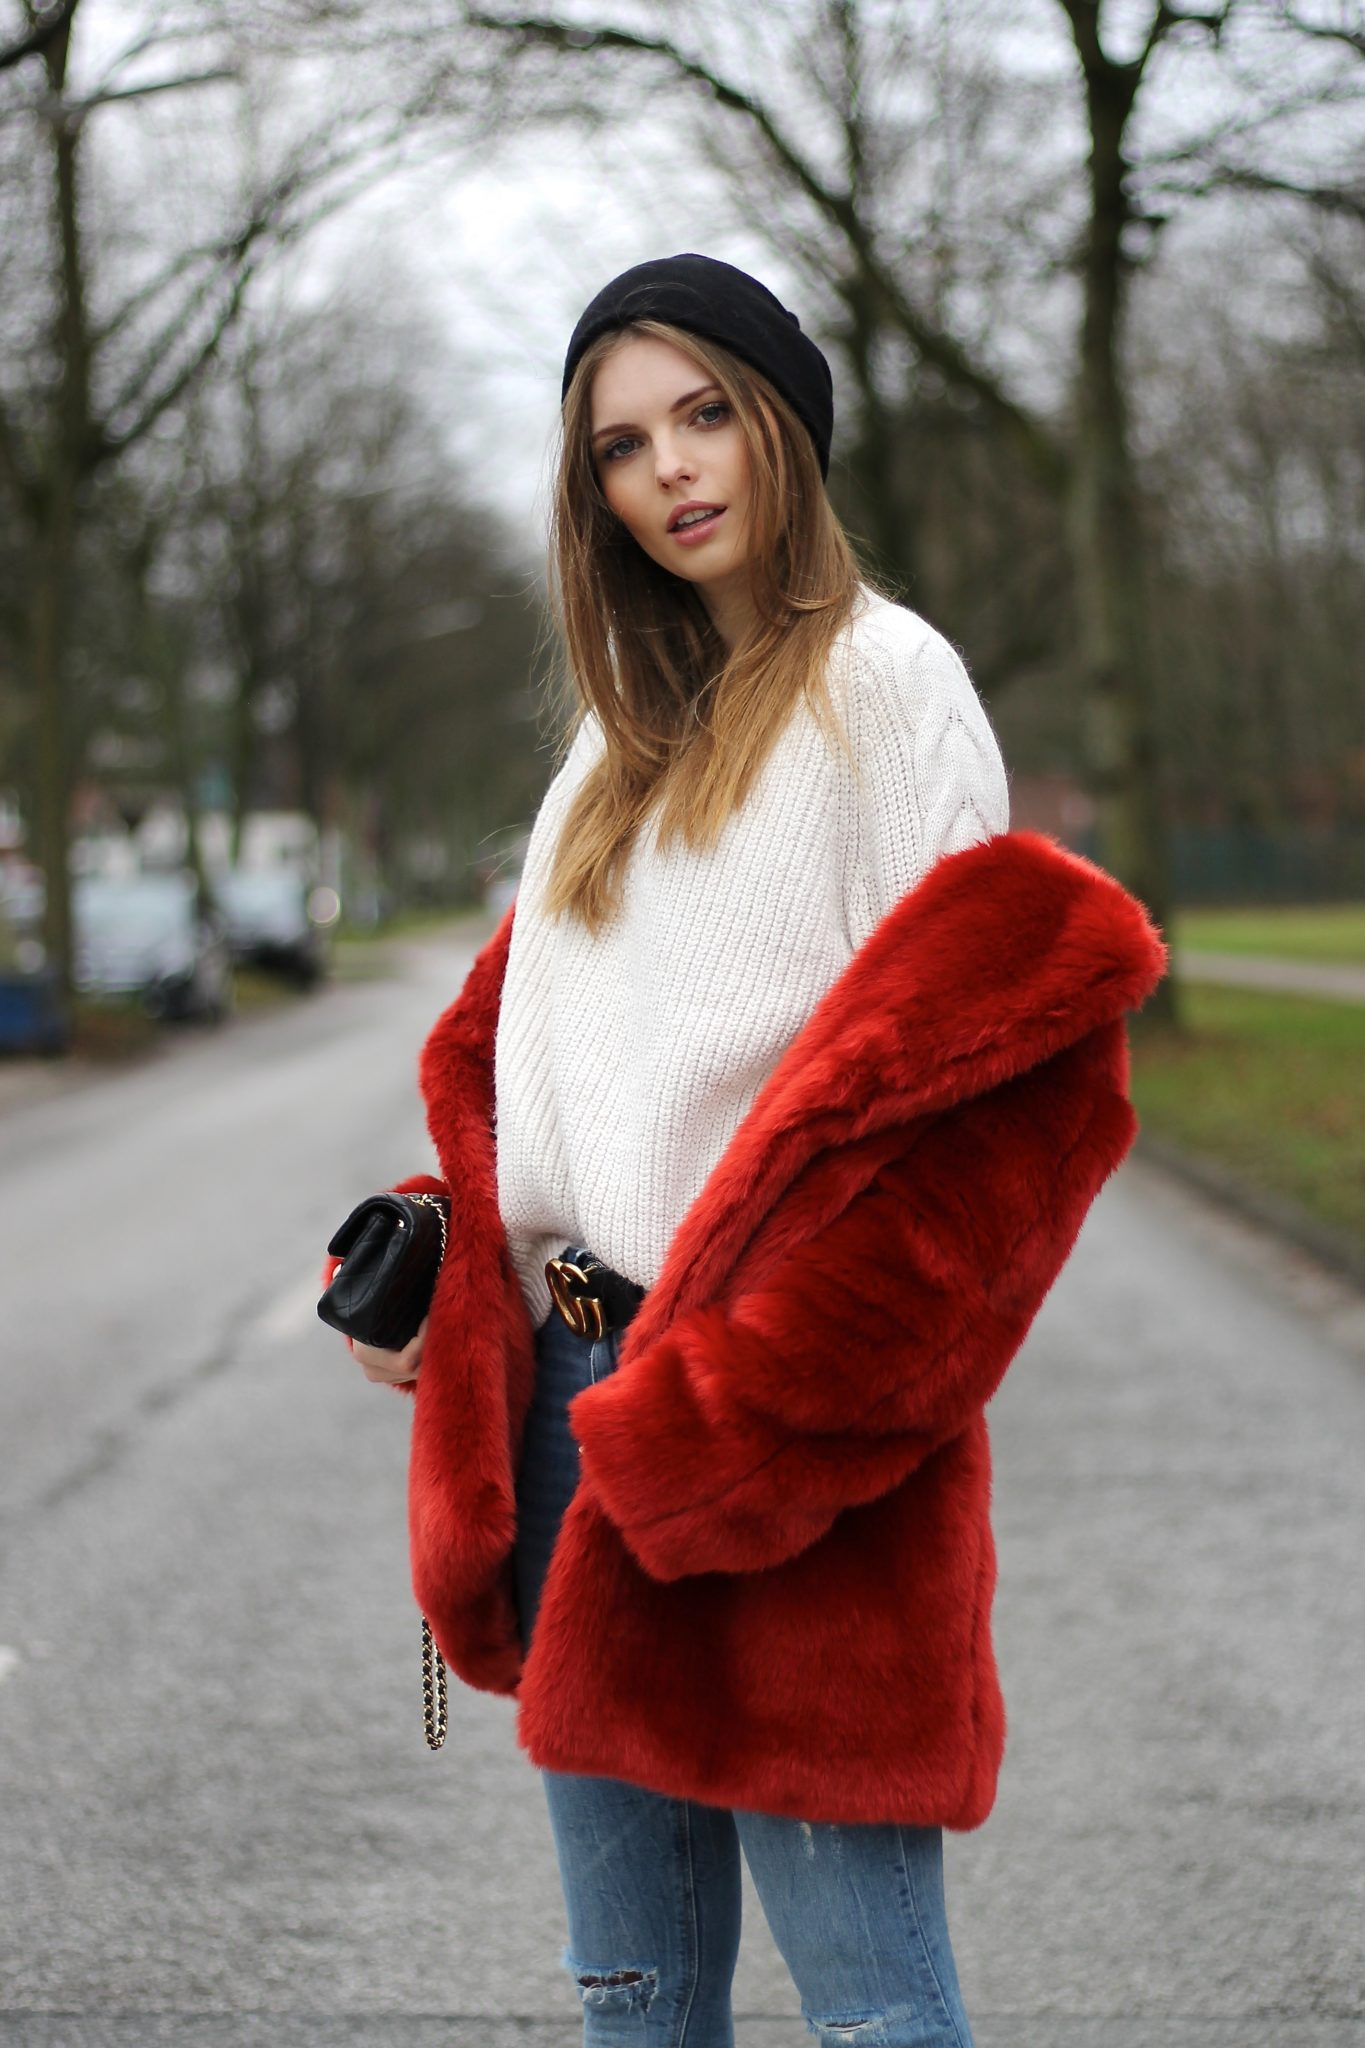 IMG 7584 - AUTUMN COLOR RED I H&M FAUX FUR COAT